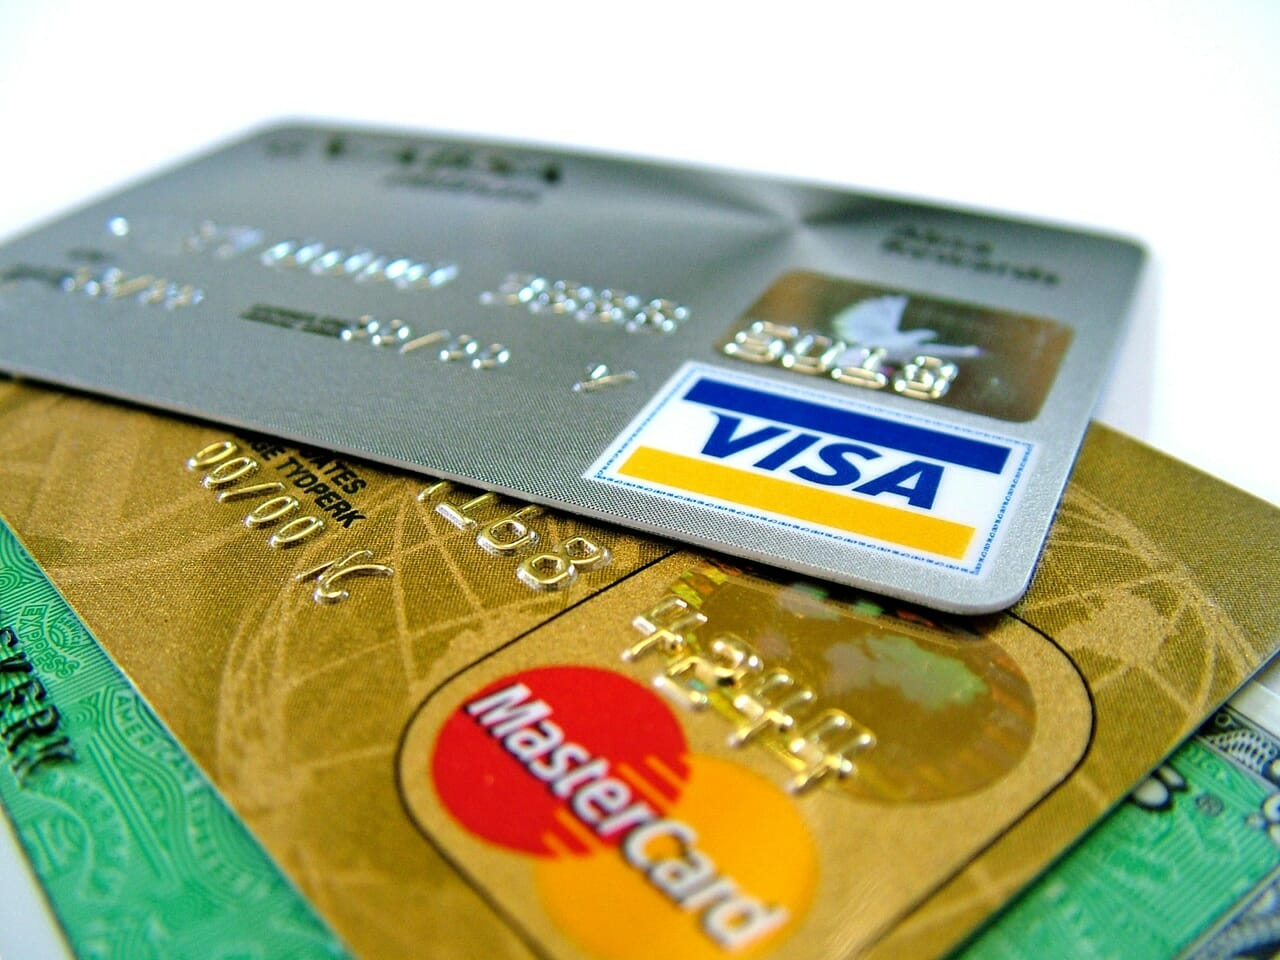 visa and master cards